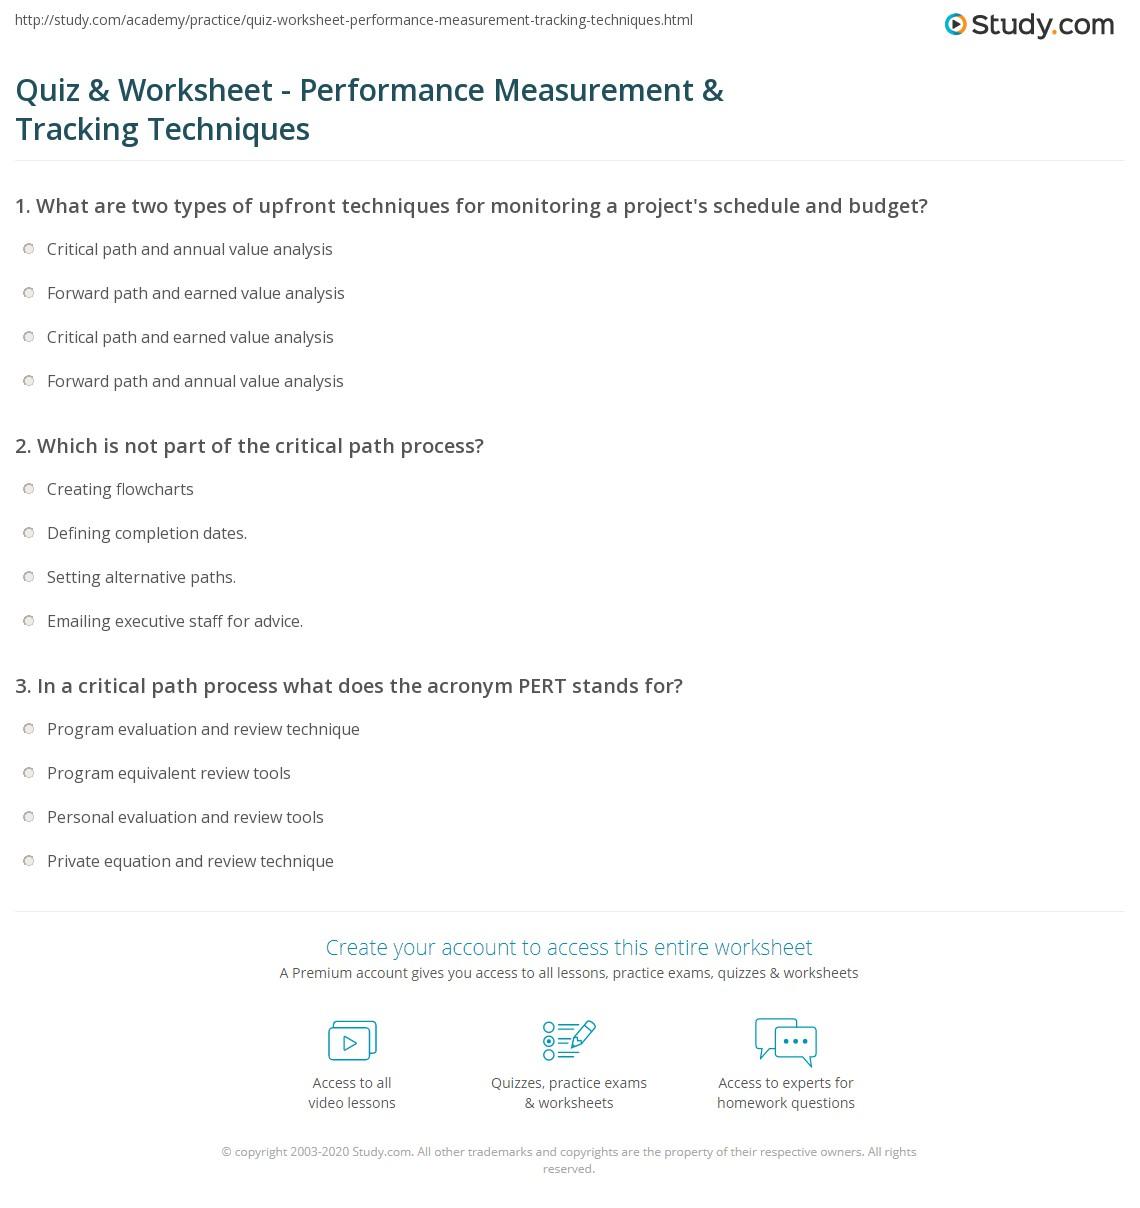 Quiz & Worksheet - Performance Measurement & Tracking